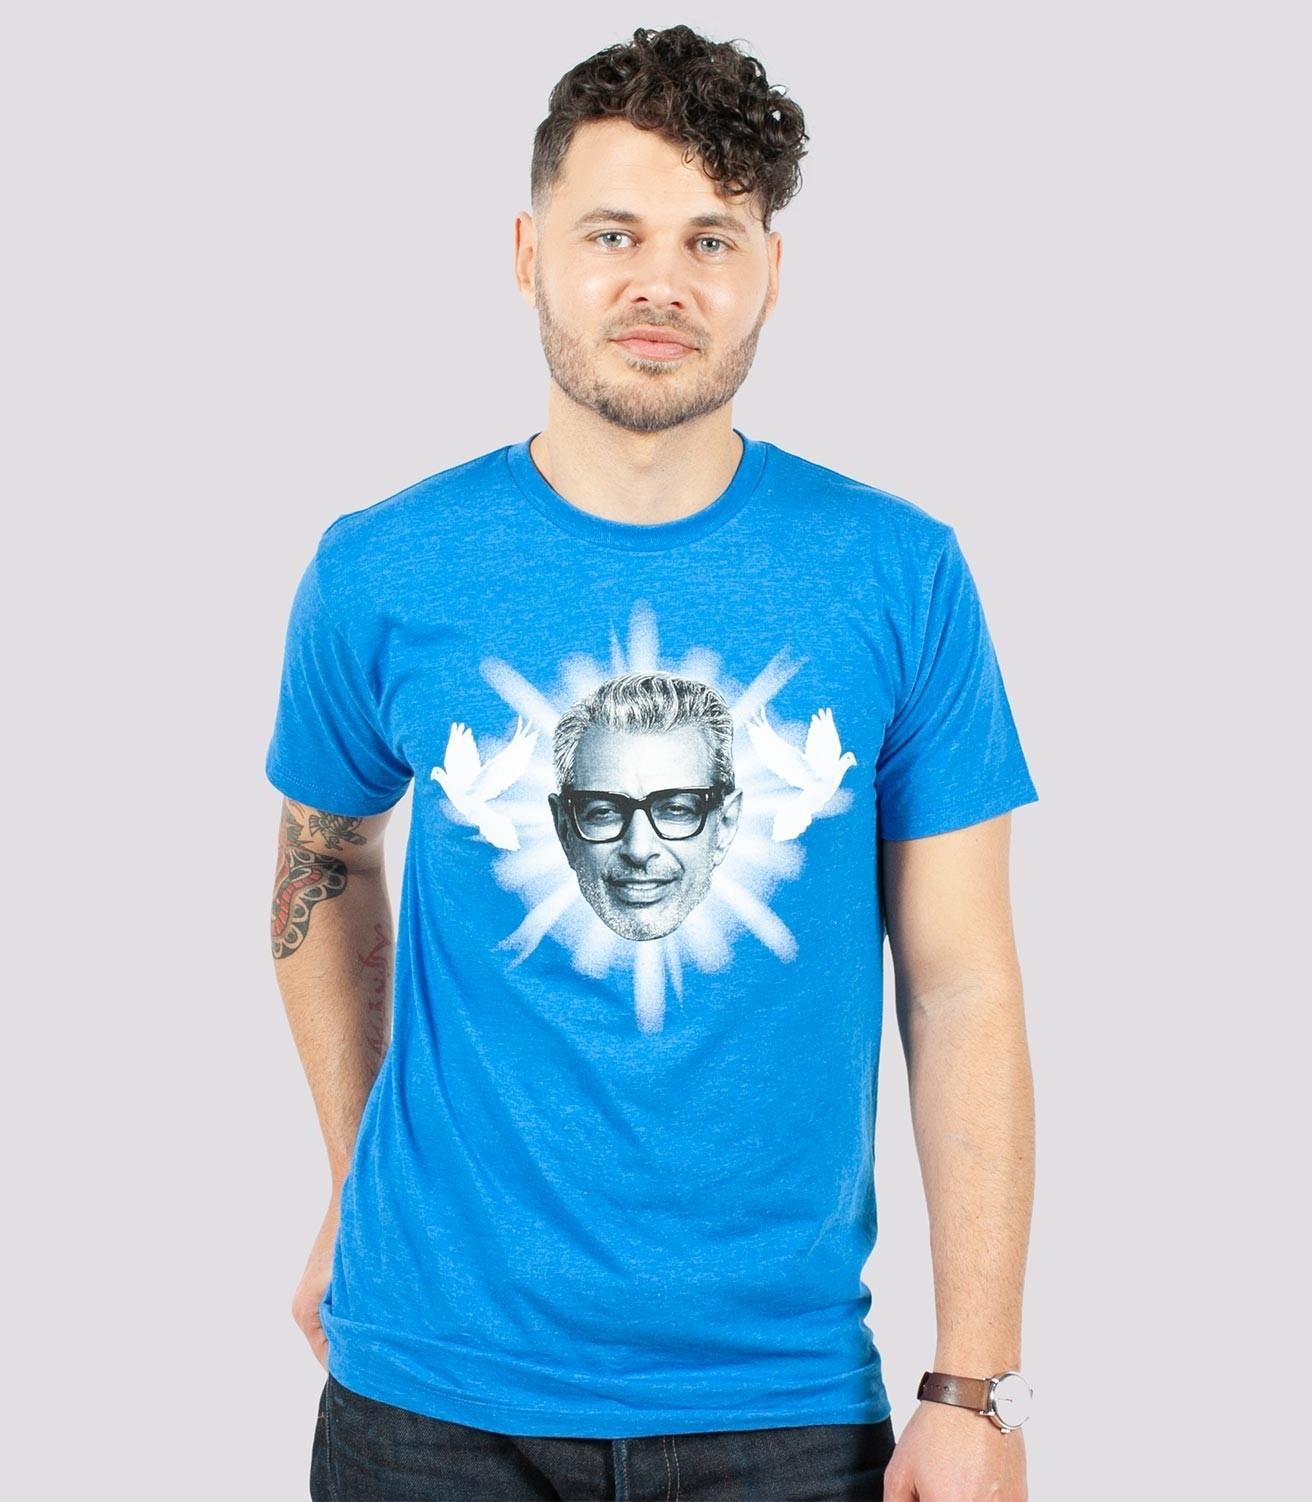 ec8737d9 Zen Goldblum Funny Men's Cotton/Poly T-Shirt   Headline Shirts